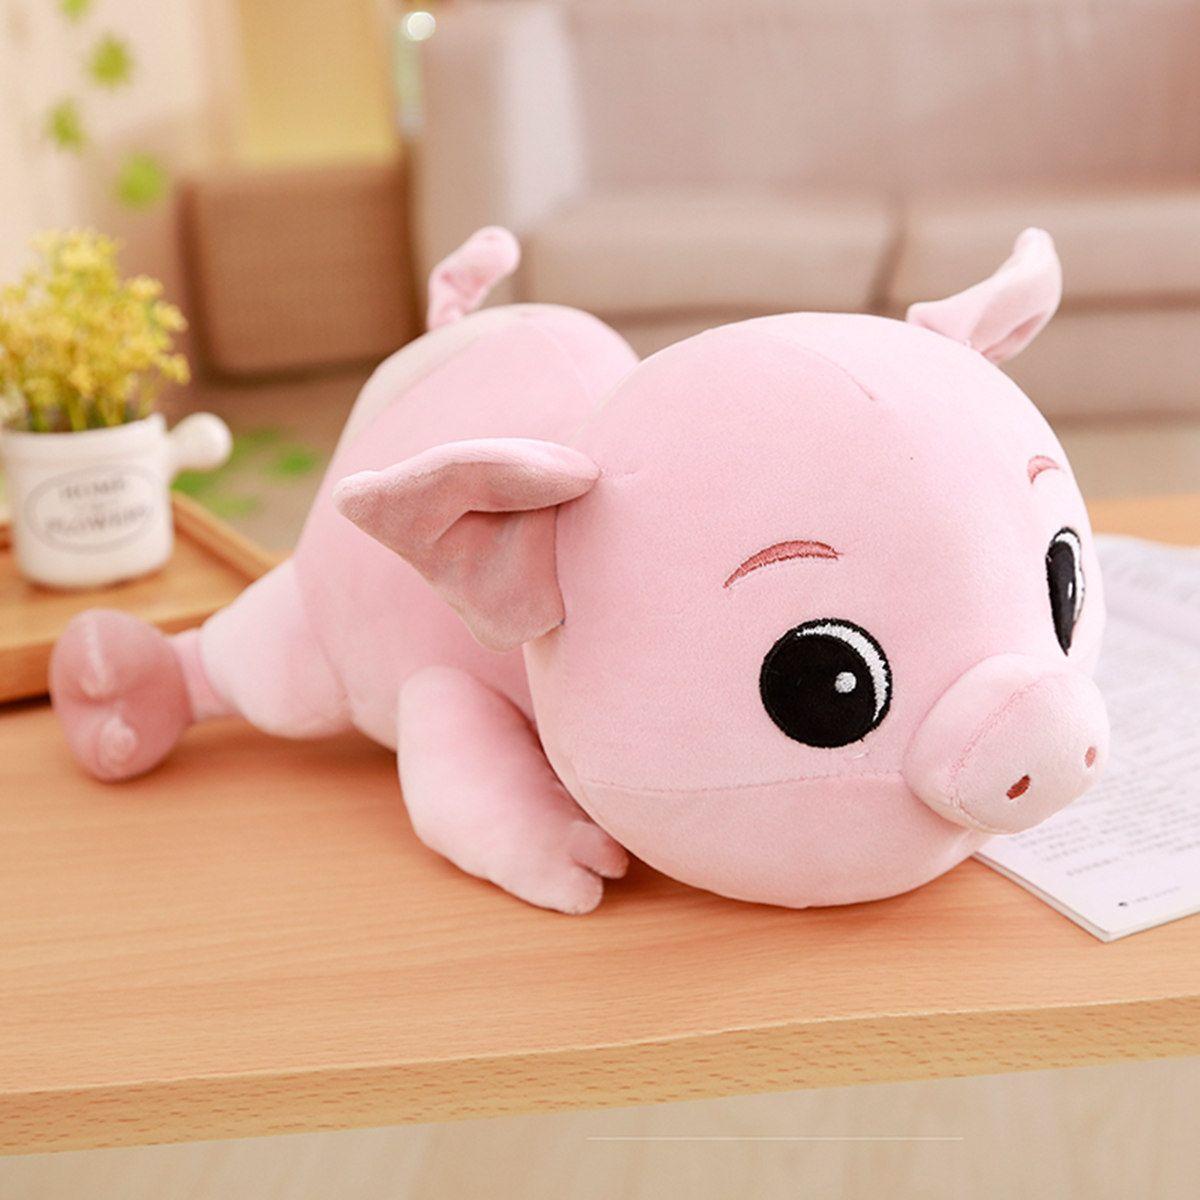 Cute Cartoon Pig Plush Doll Soft Stuffed Animal Pink Piggy Baby Pillow Kids Birthday Gift Home Sofa Room Decor Valentine's Gift